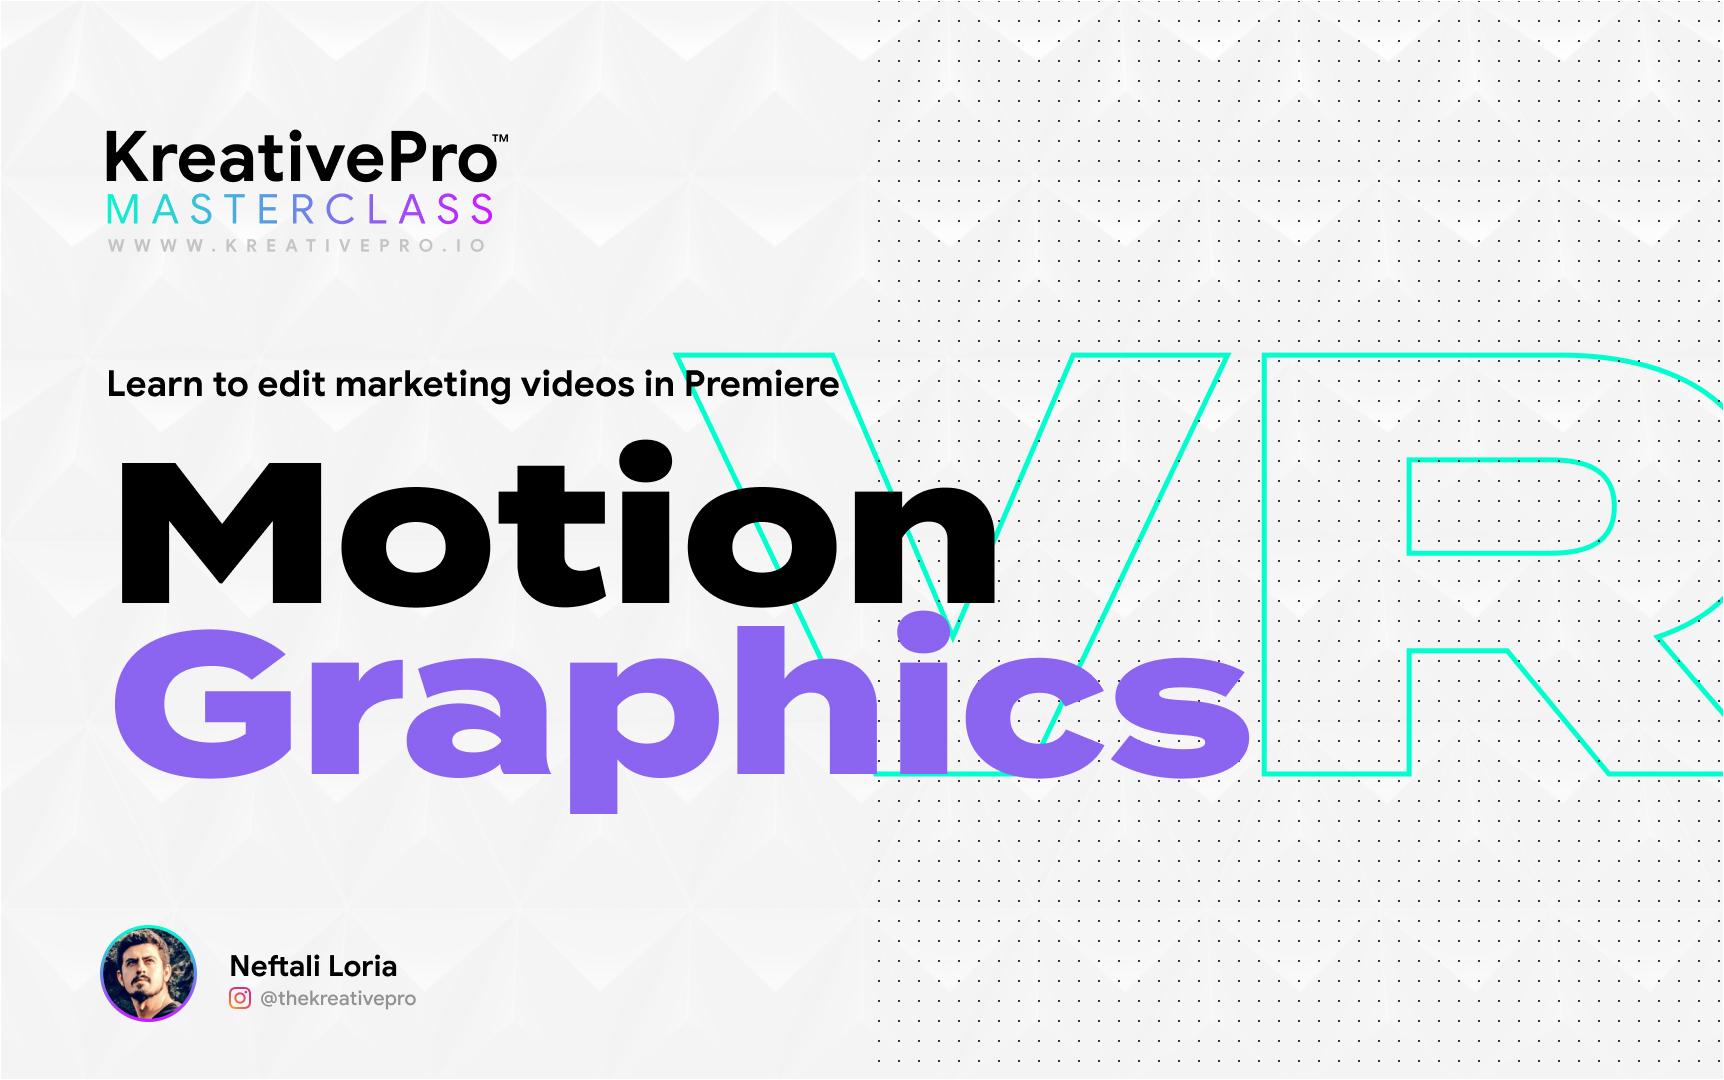 Adobe Premiere 3.8 - Motion Graphics